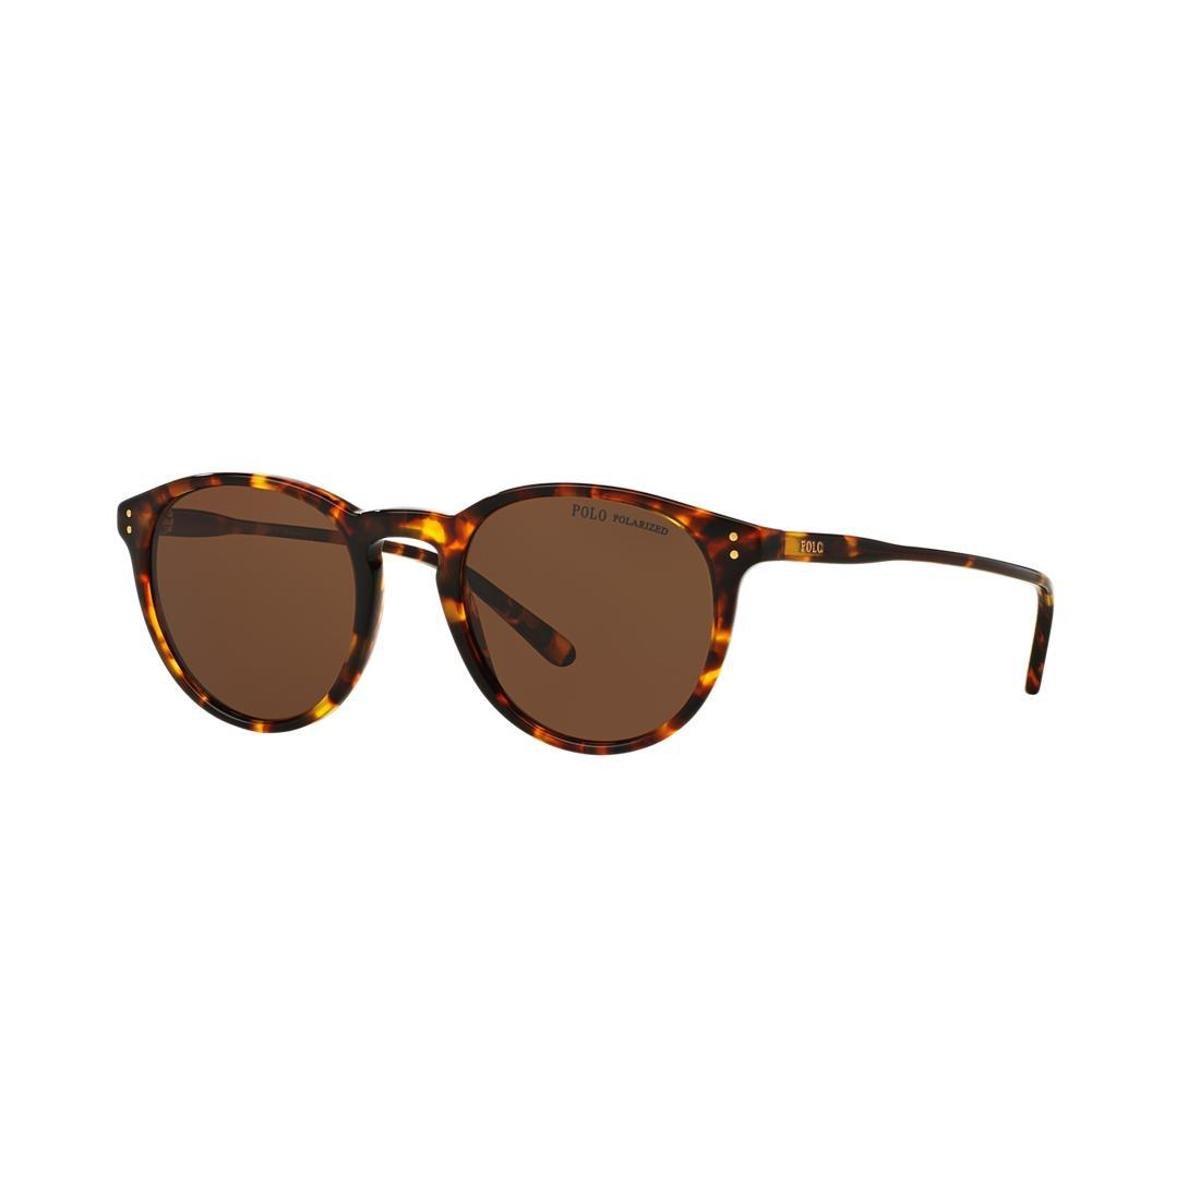 Óculos de Sol Polo Ralph Lauren PH4110 - Compre Agora   Zattini d67daf67ec